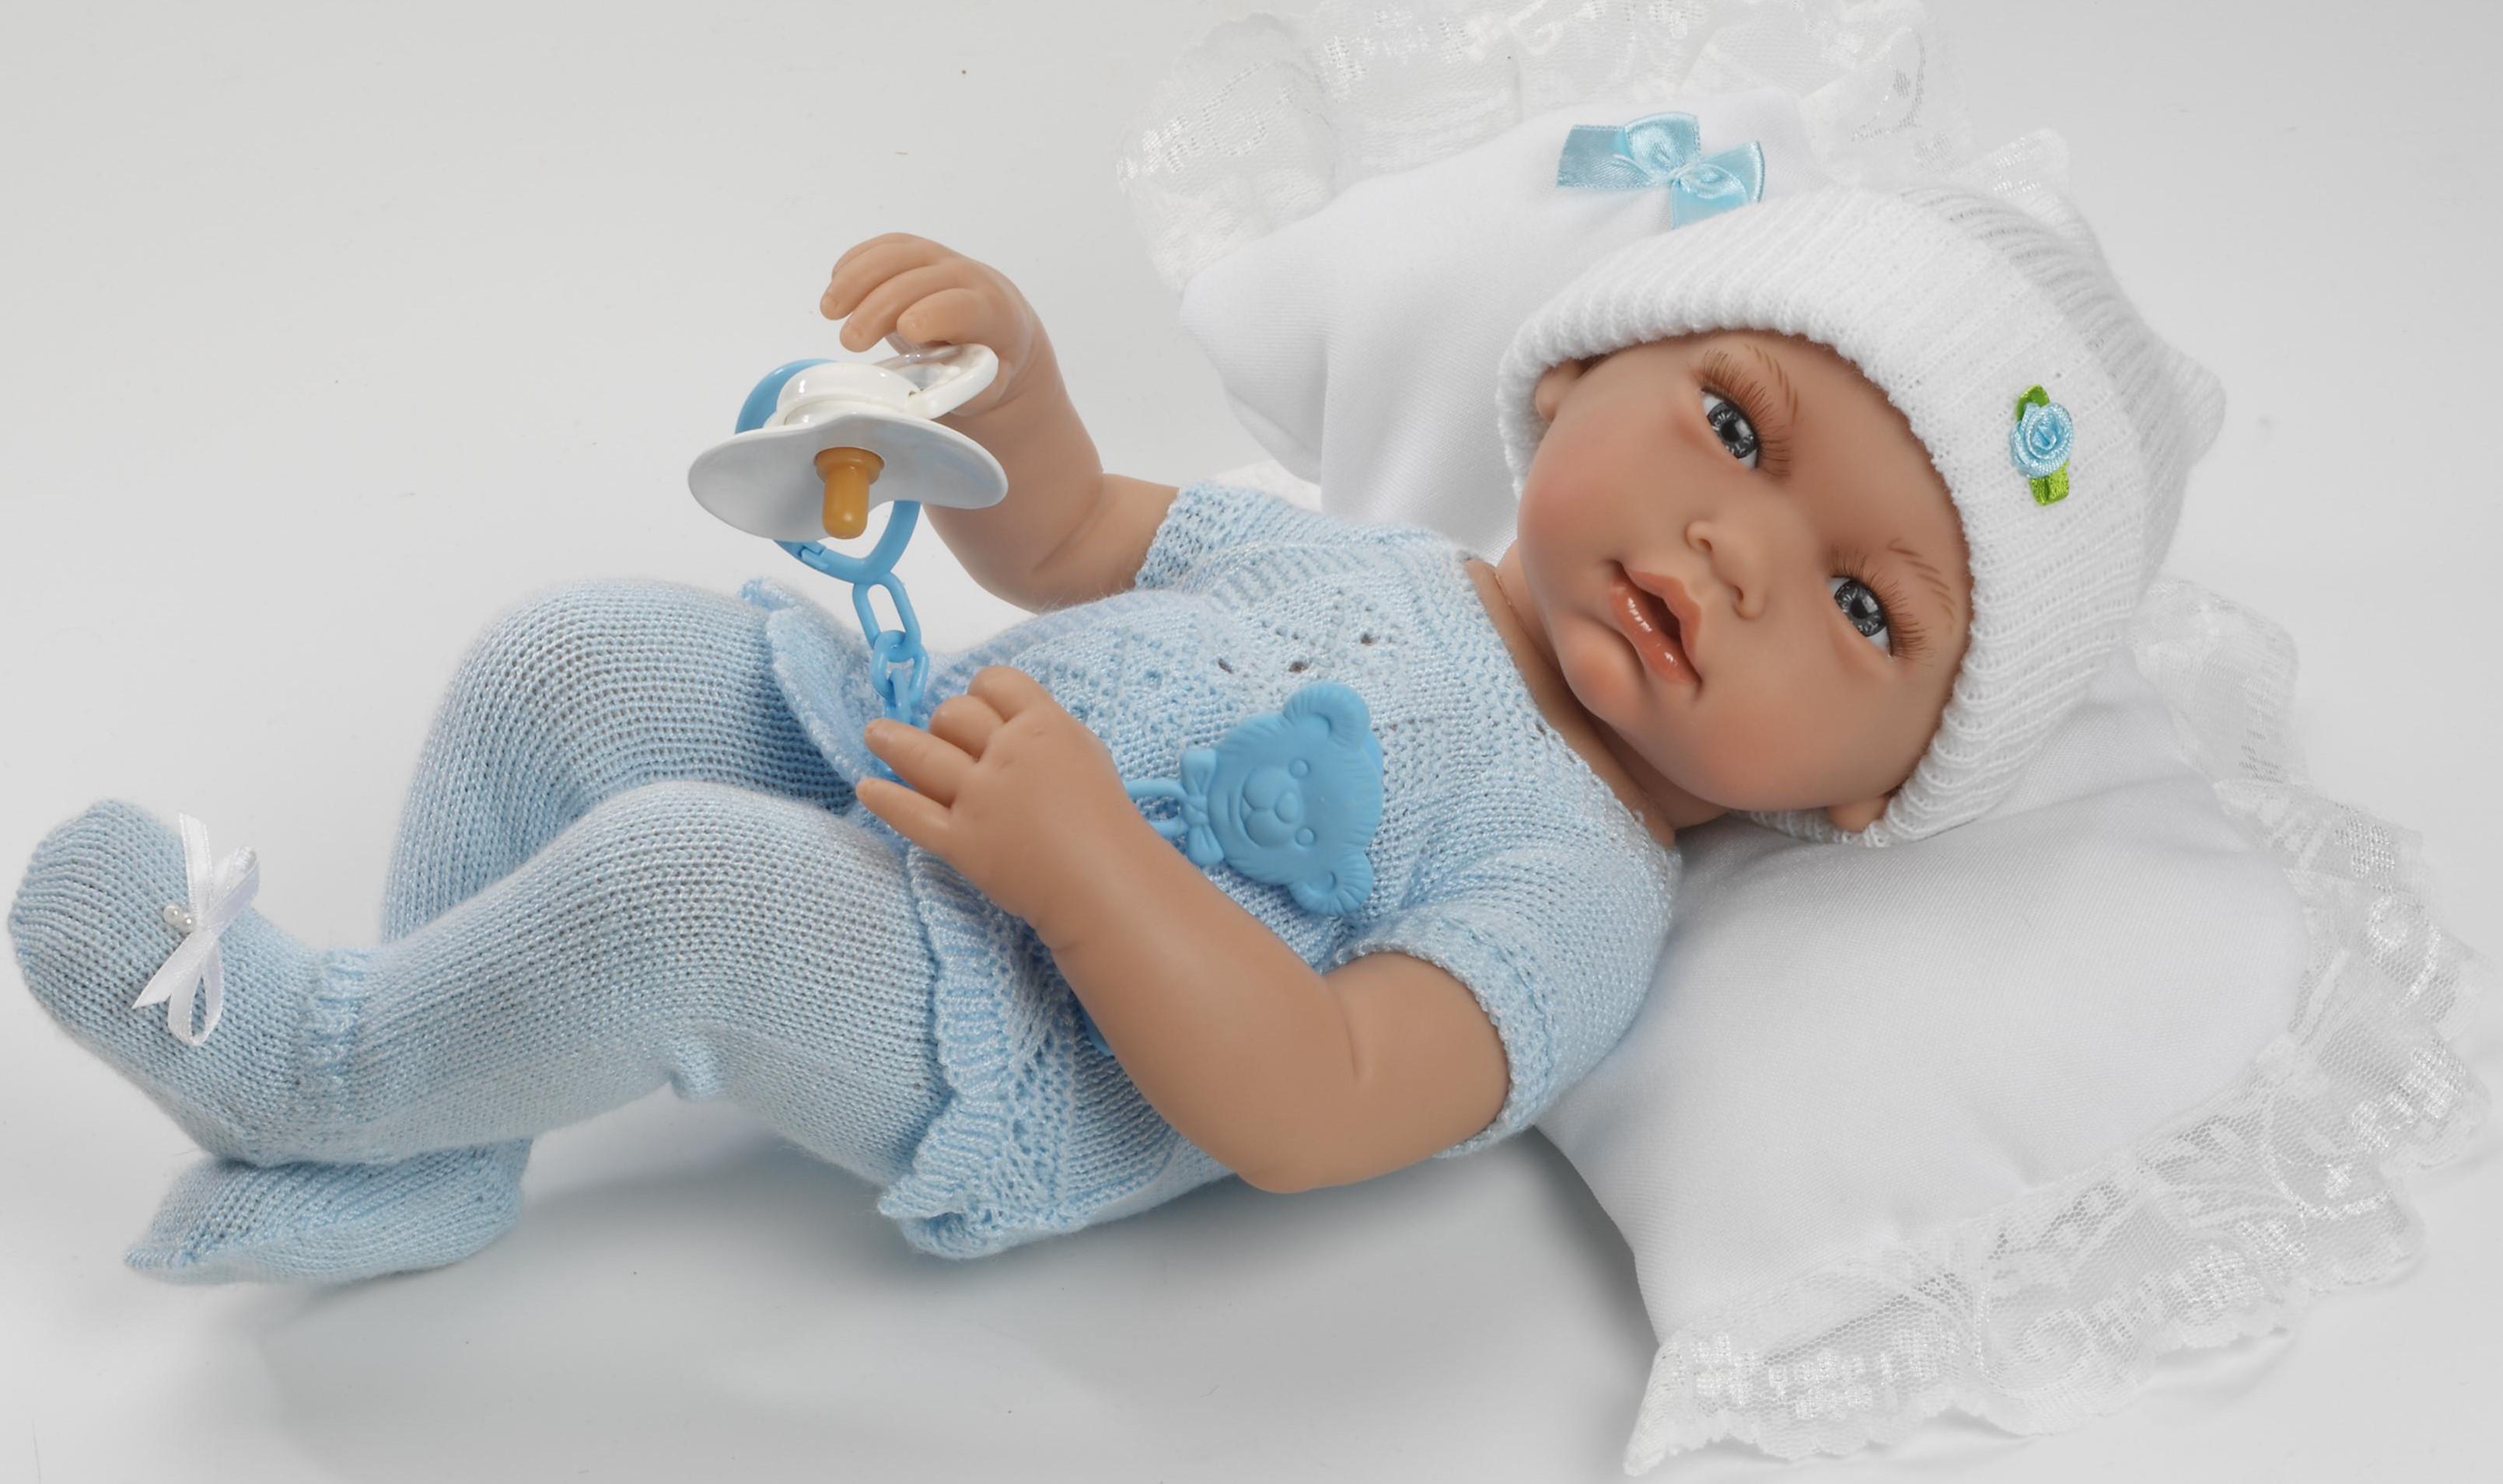 Realistické miminko - chlapeček Josífek od firmy Guca ze Španělska (Doprava zdarma)